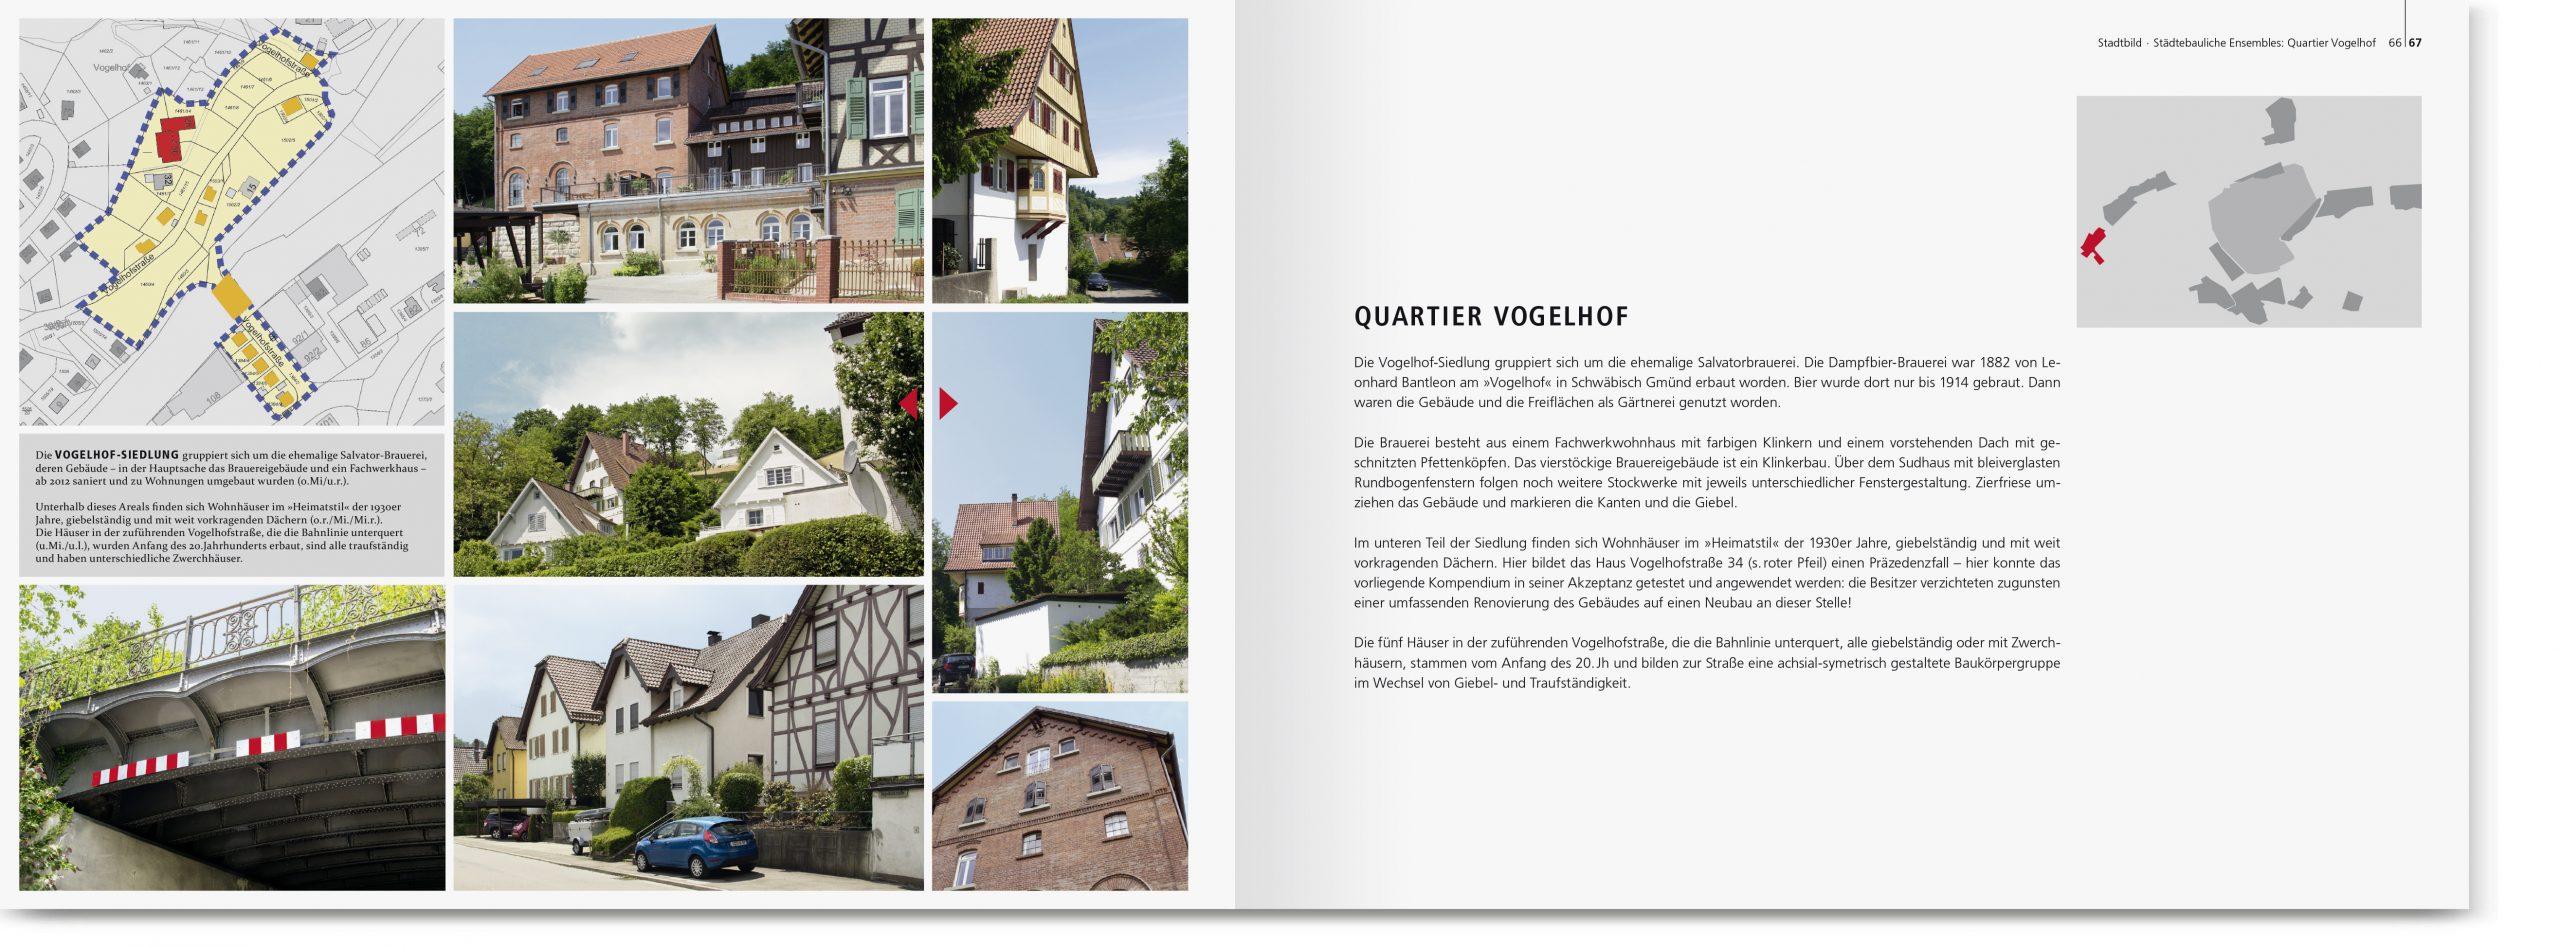 fh-web-kompendium-baukultur-6-scaled.jpg